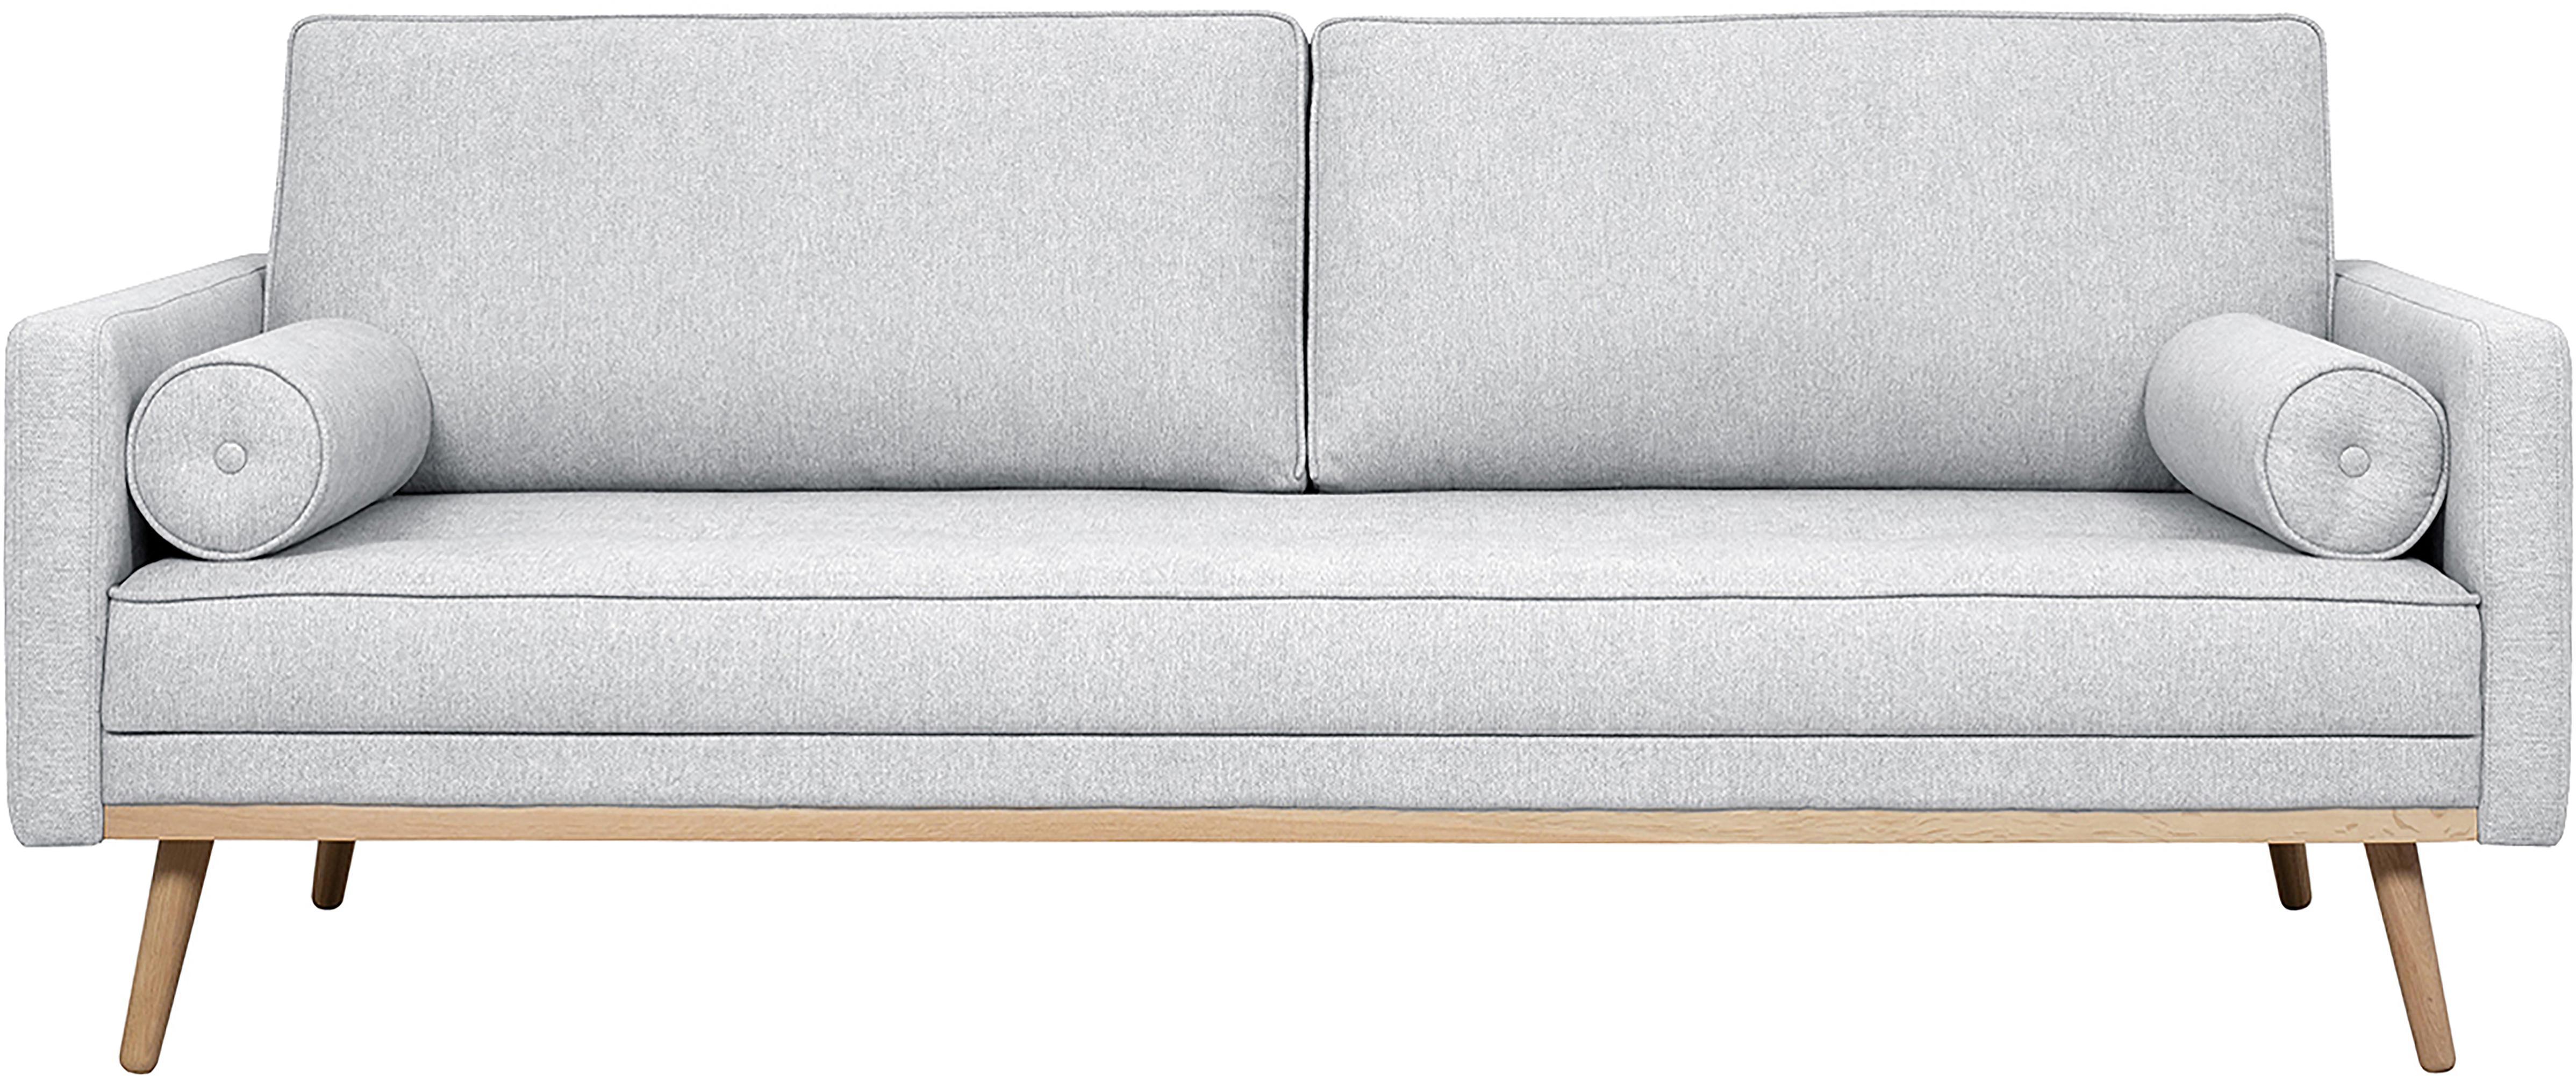 Bank Saint (3-zits), Bekleding: polyester, Frame: massief grenenhout, spaan, Lichtgrijs, 210 x 70 cm